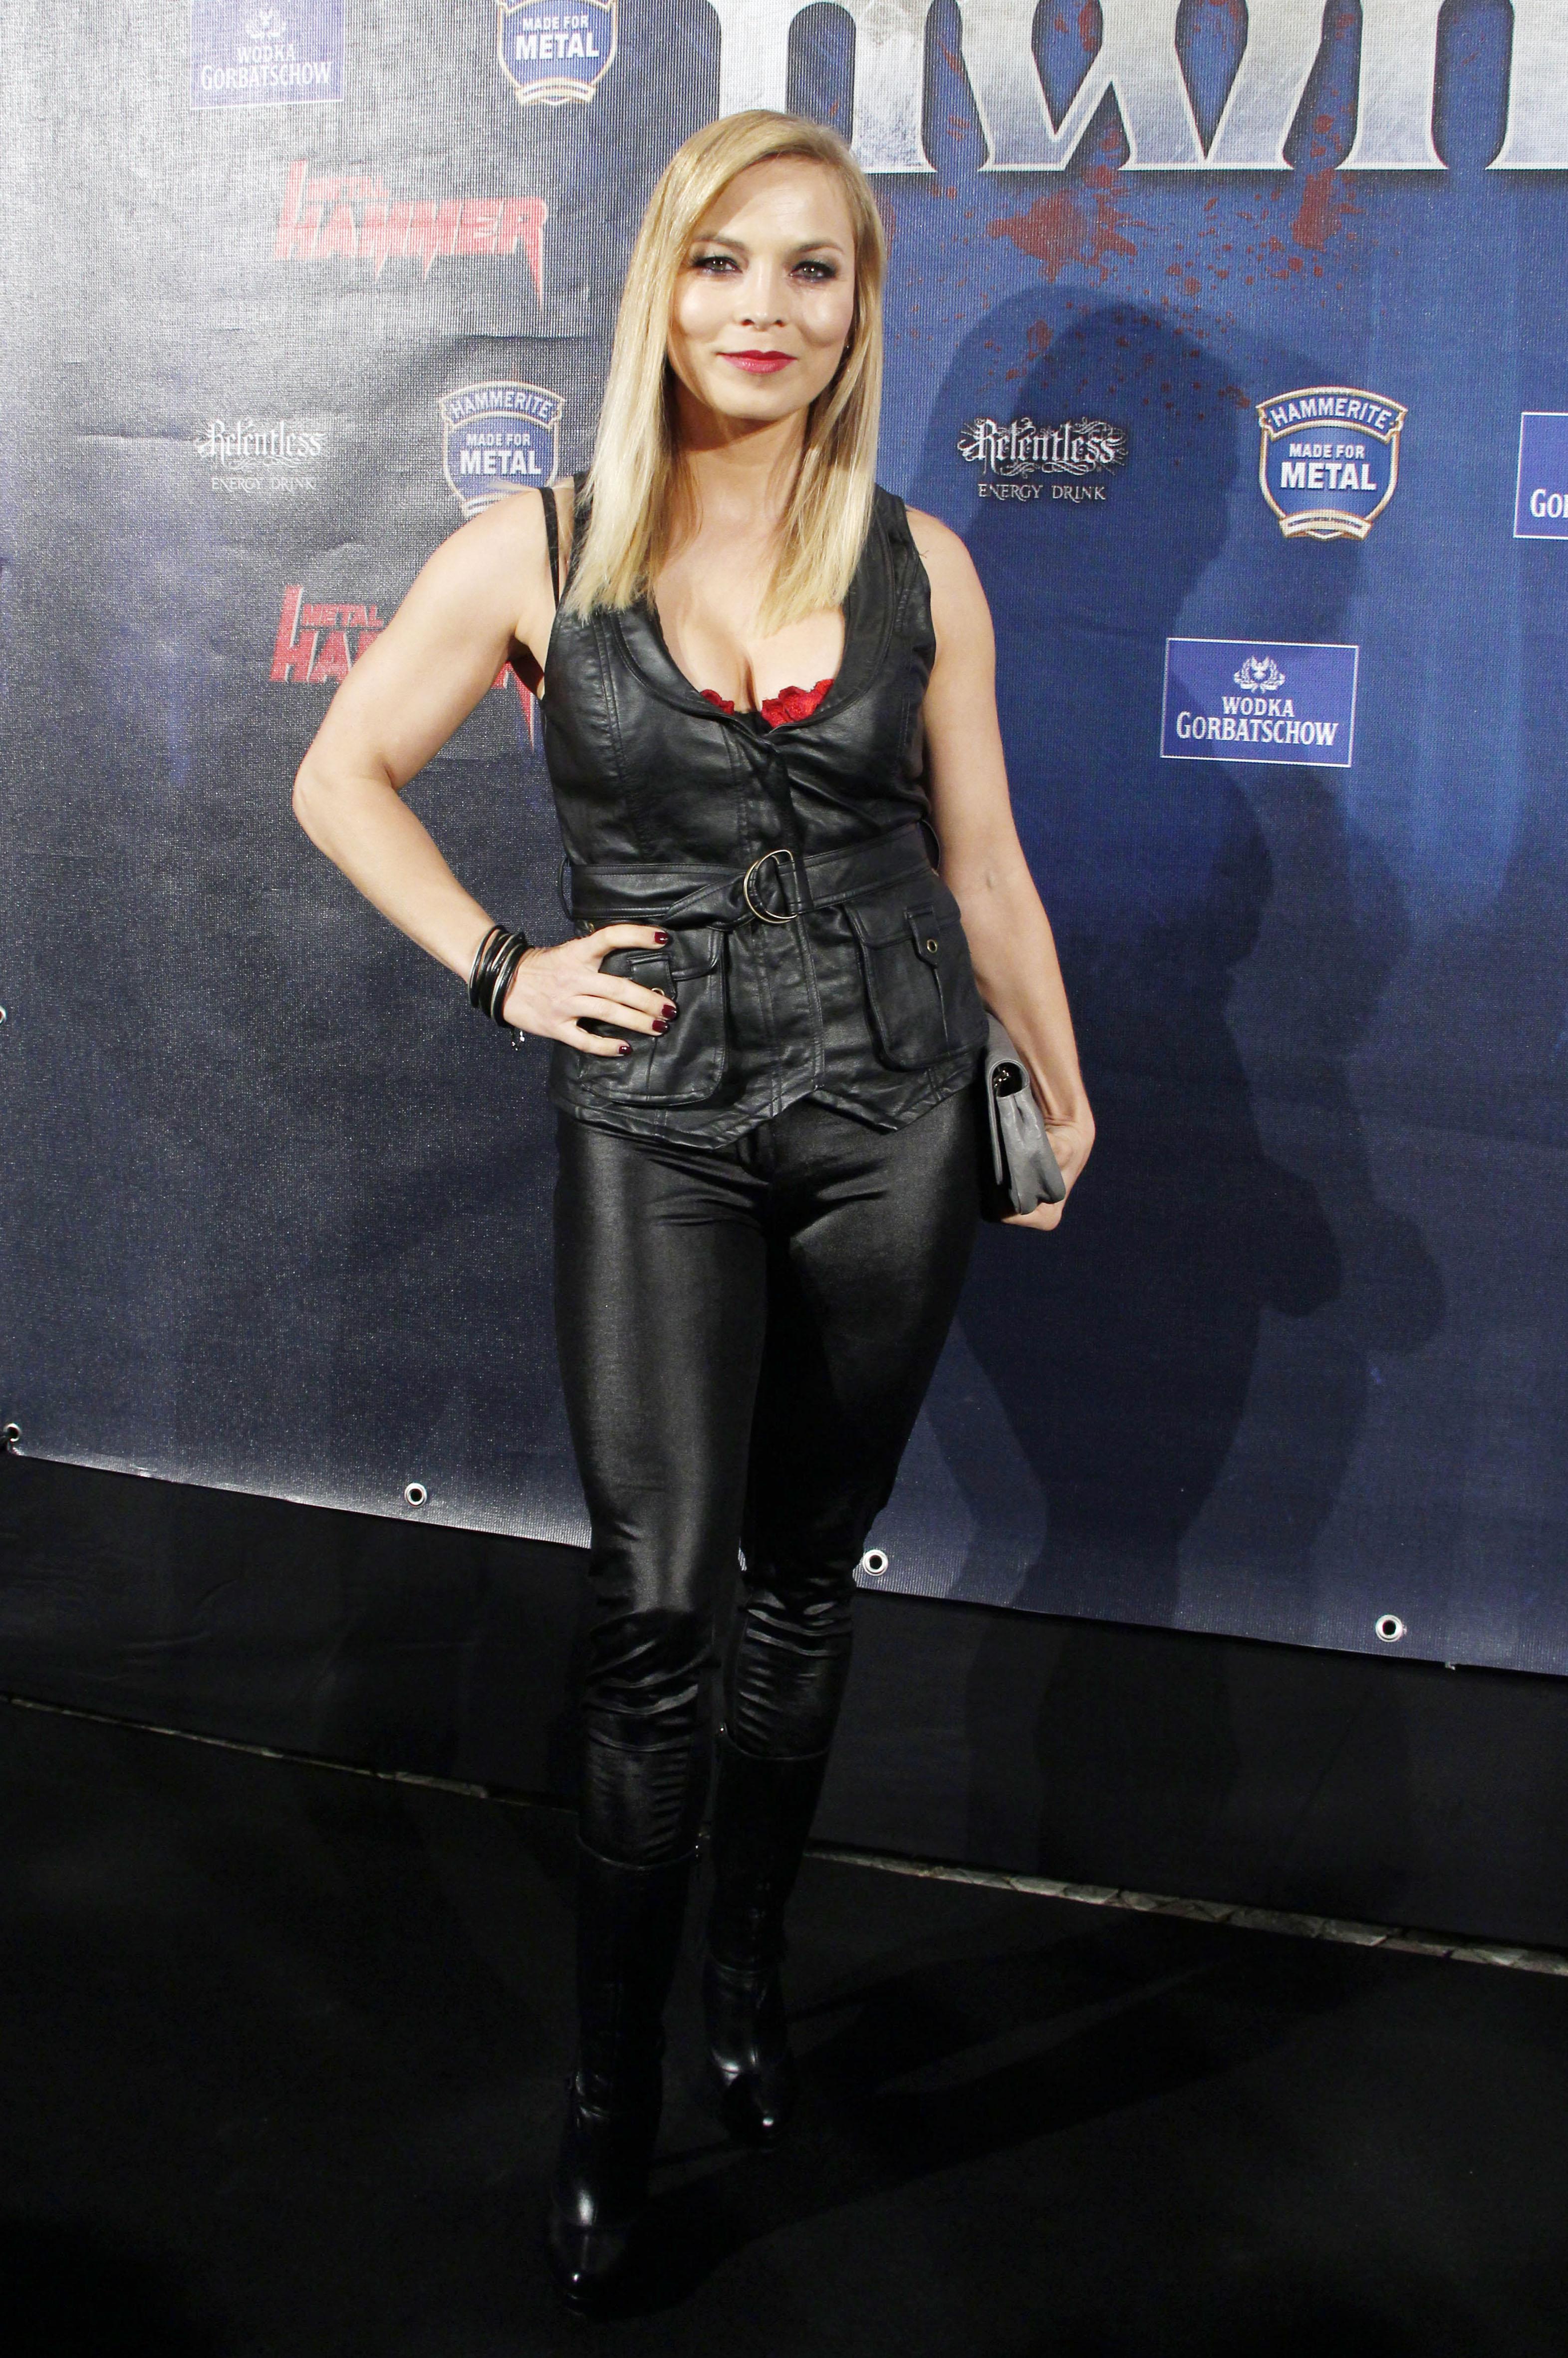 Regina_Halmich_20130913_Metal_Awards_021.jpg